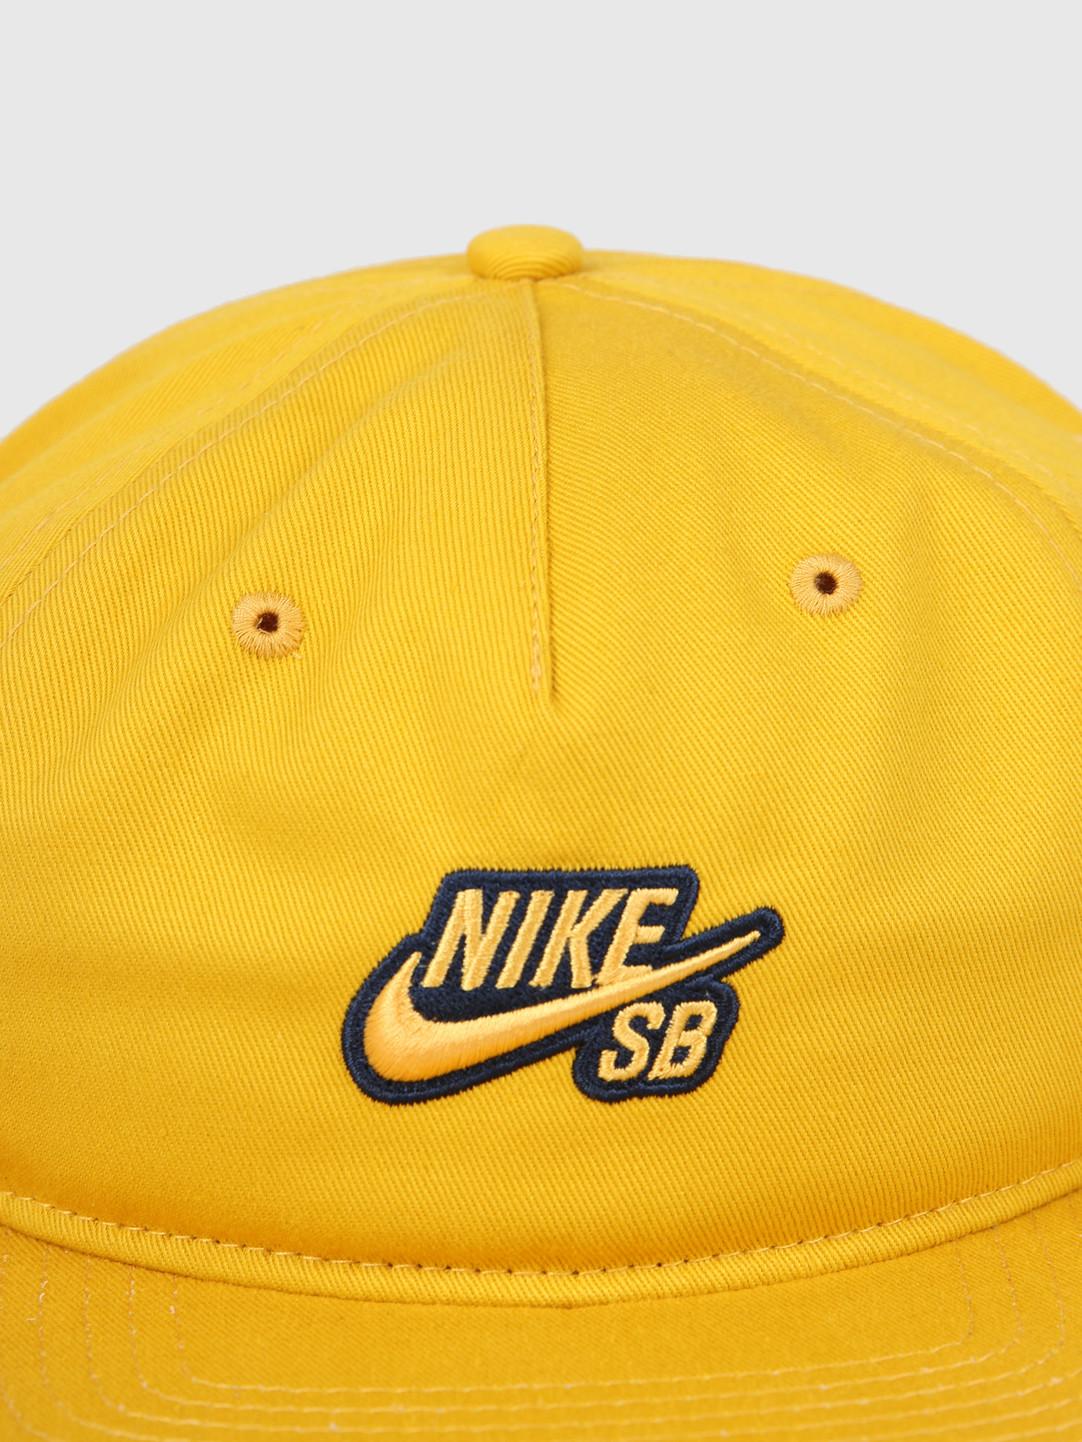 Nike Nike SB Cap Dark Sulfur Obsidian Dark Sulfur CI4460 743